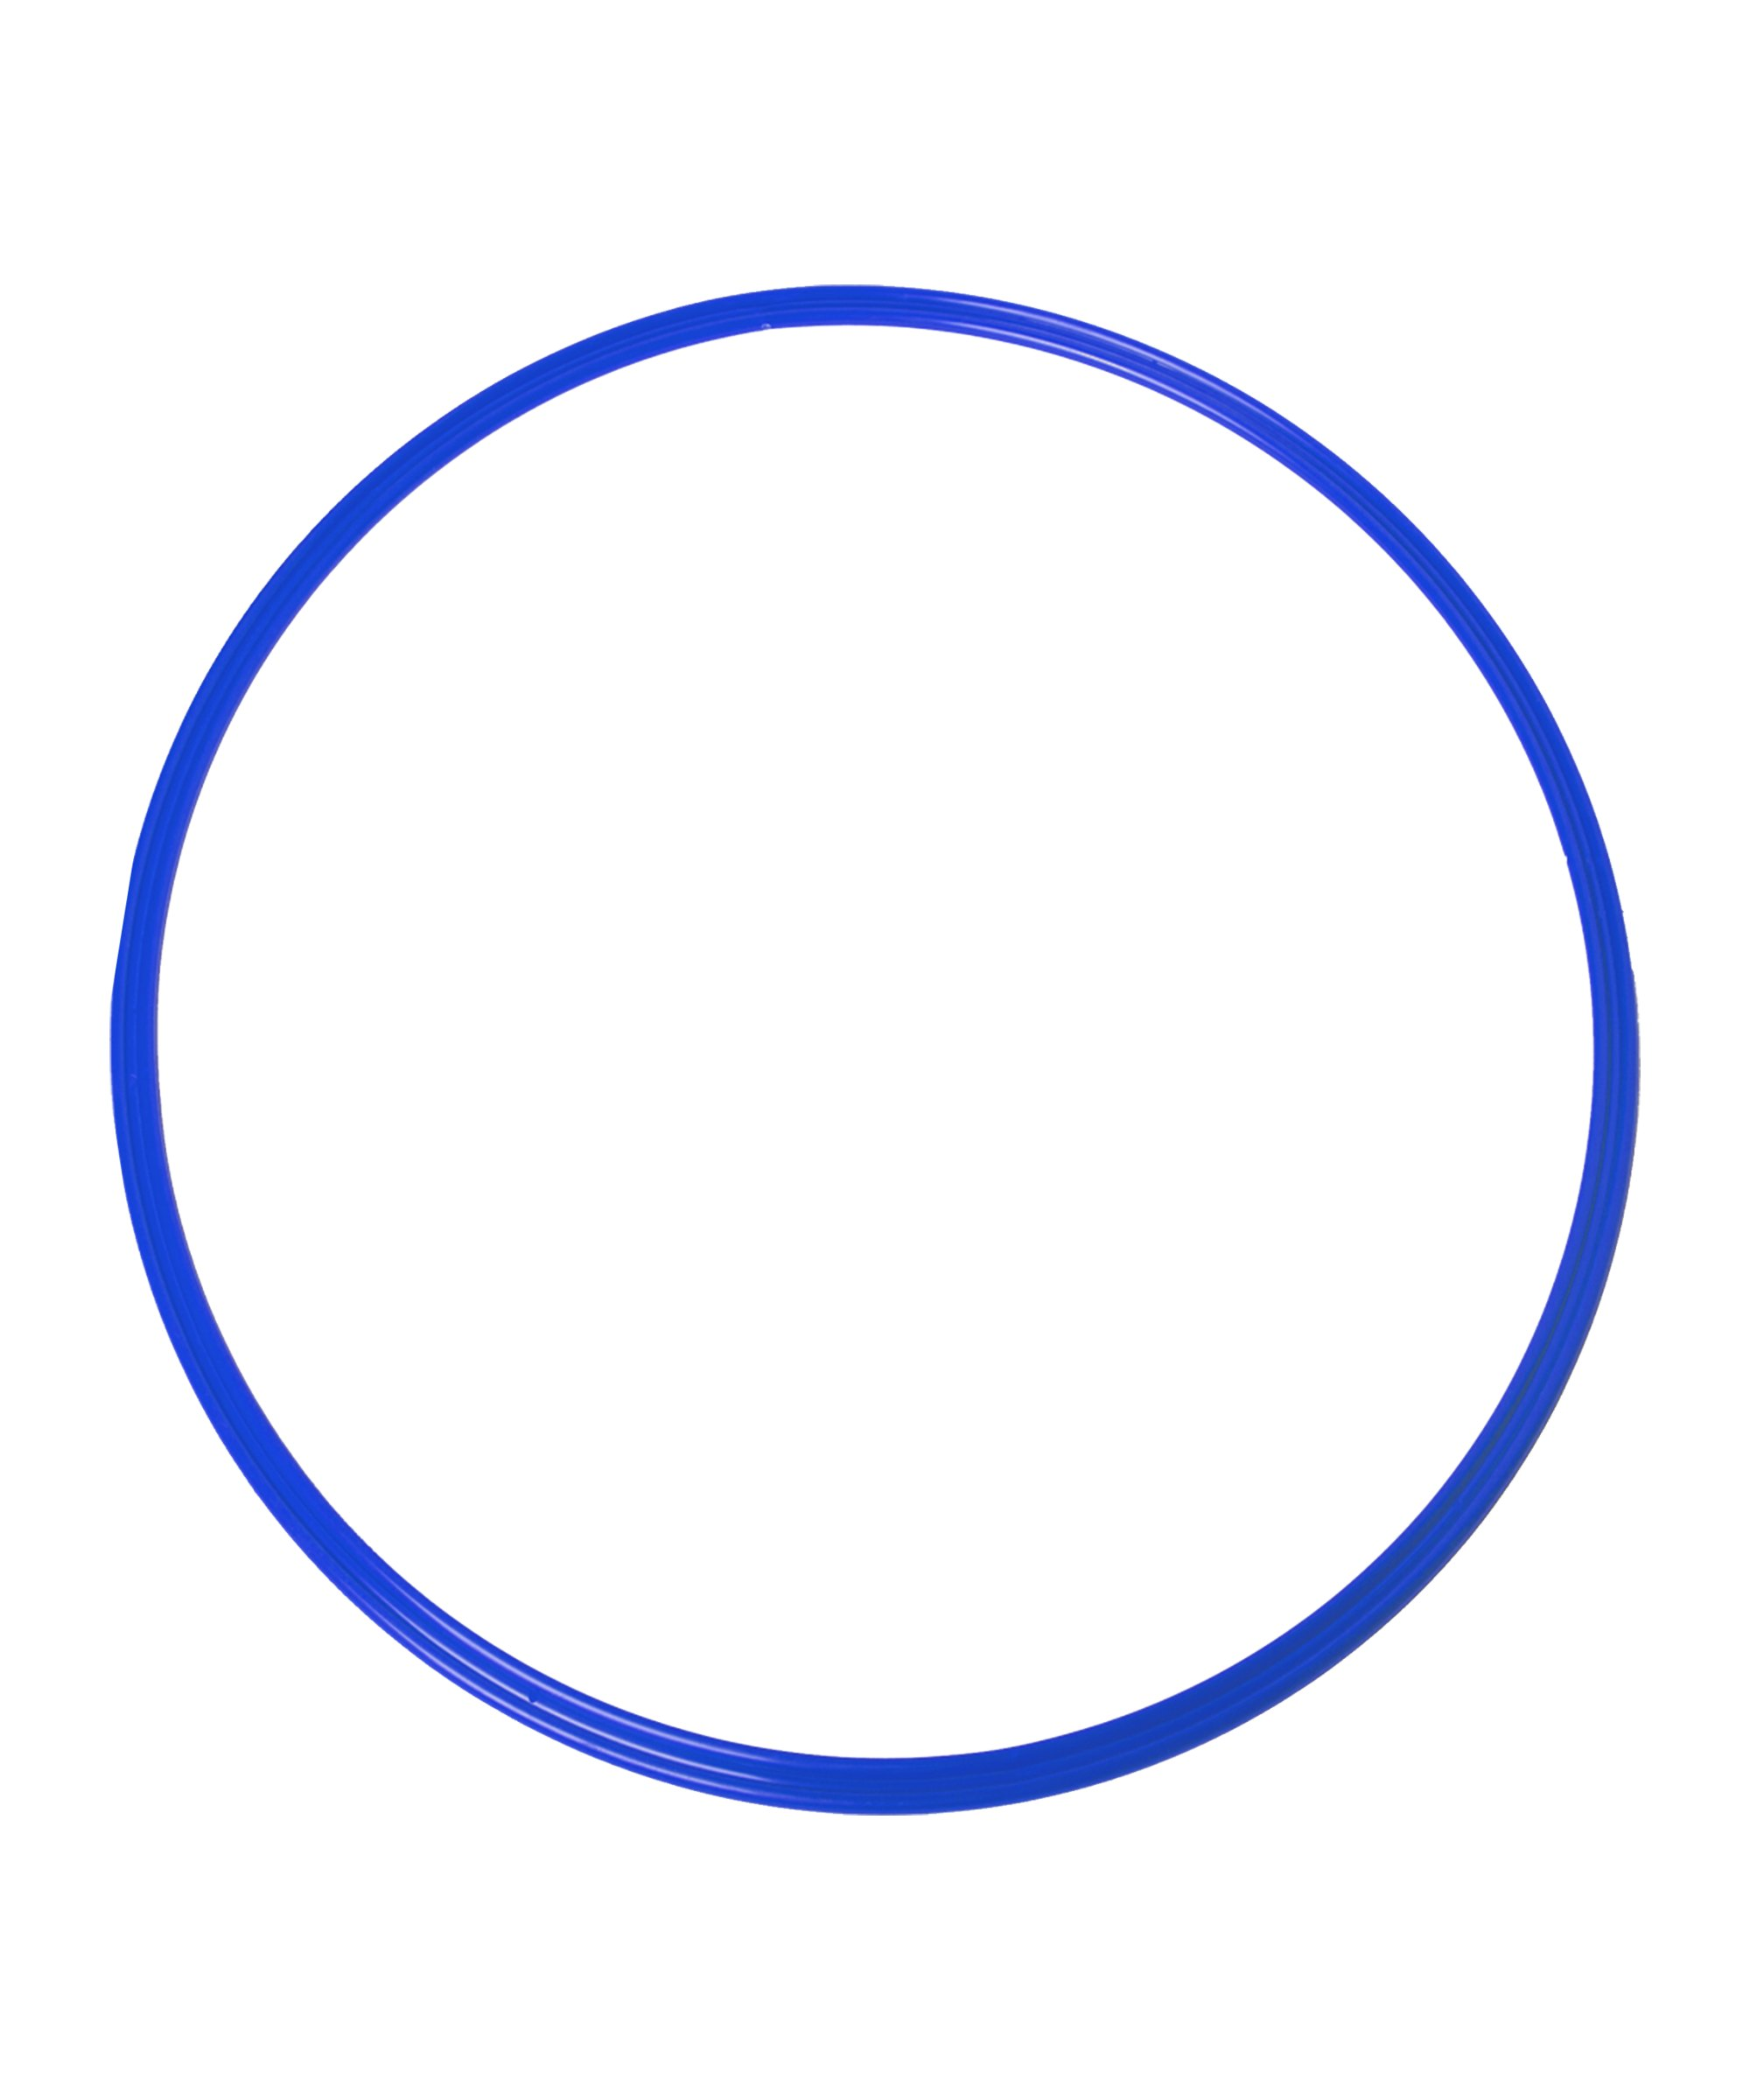 Cawila Koordinationsringe L 10er Set d70cm Blau - blau